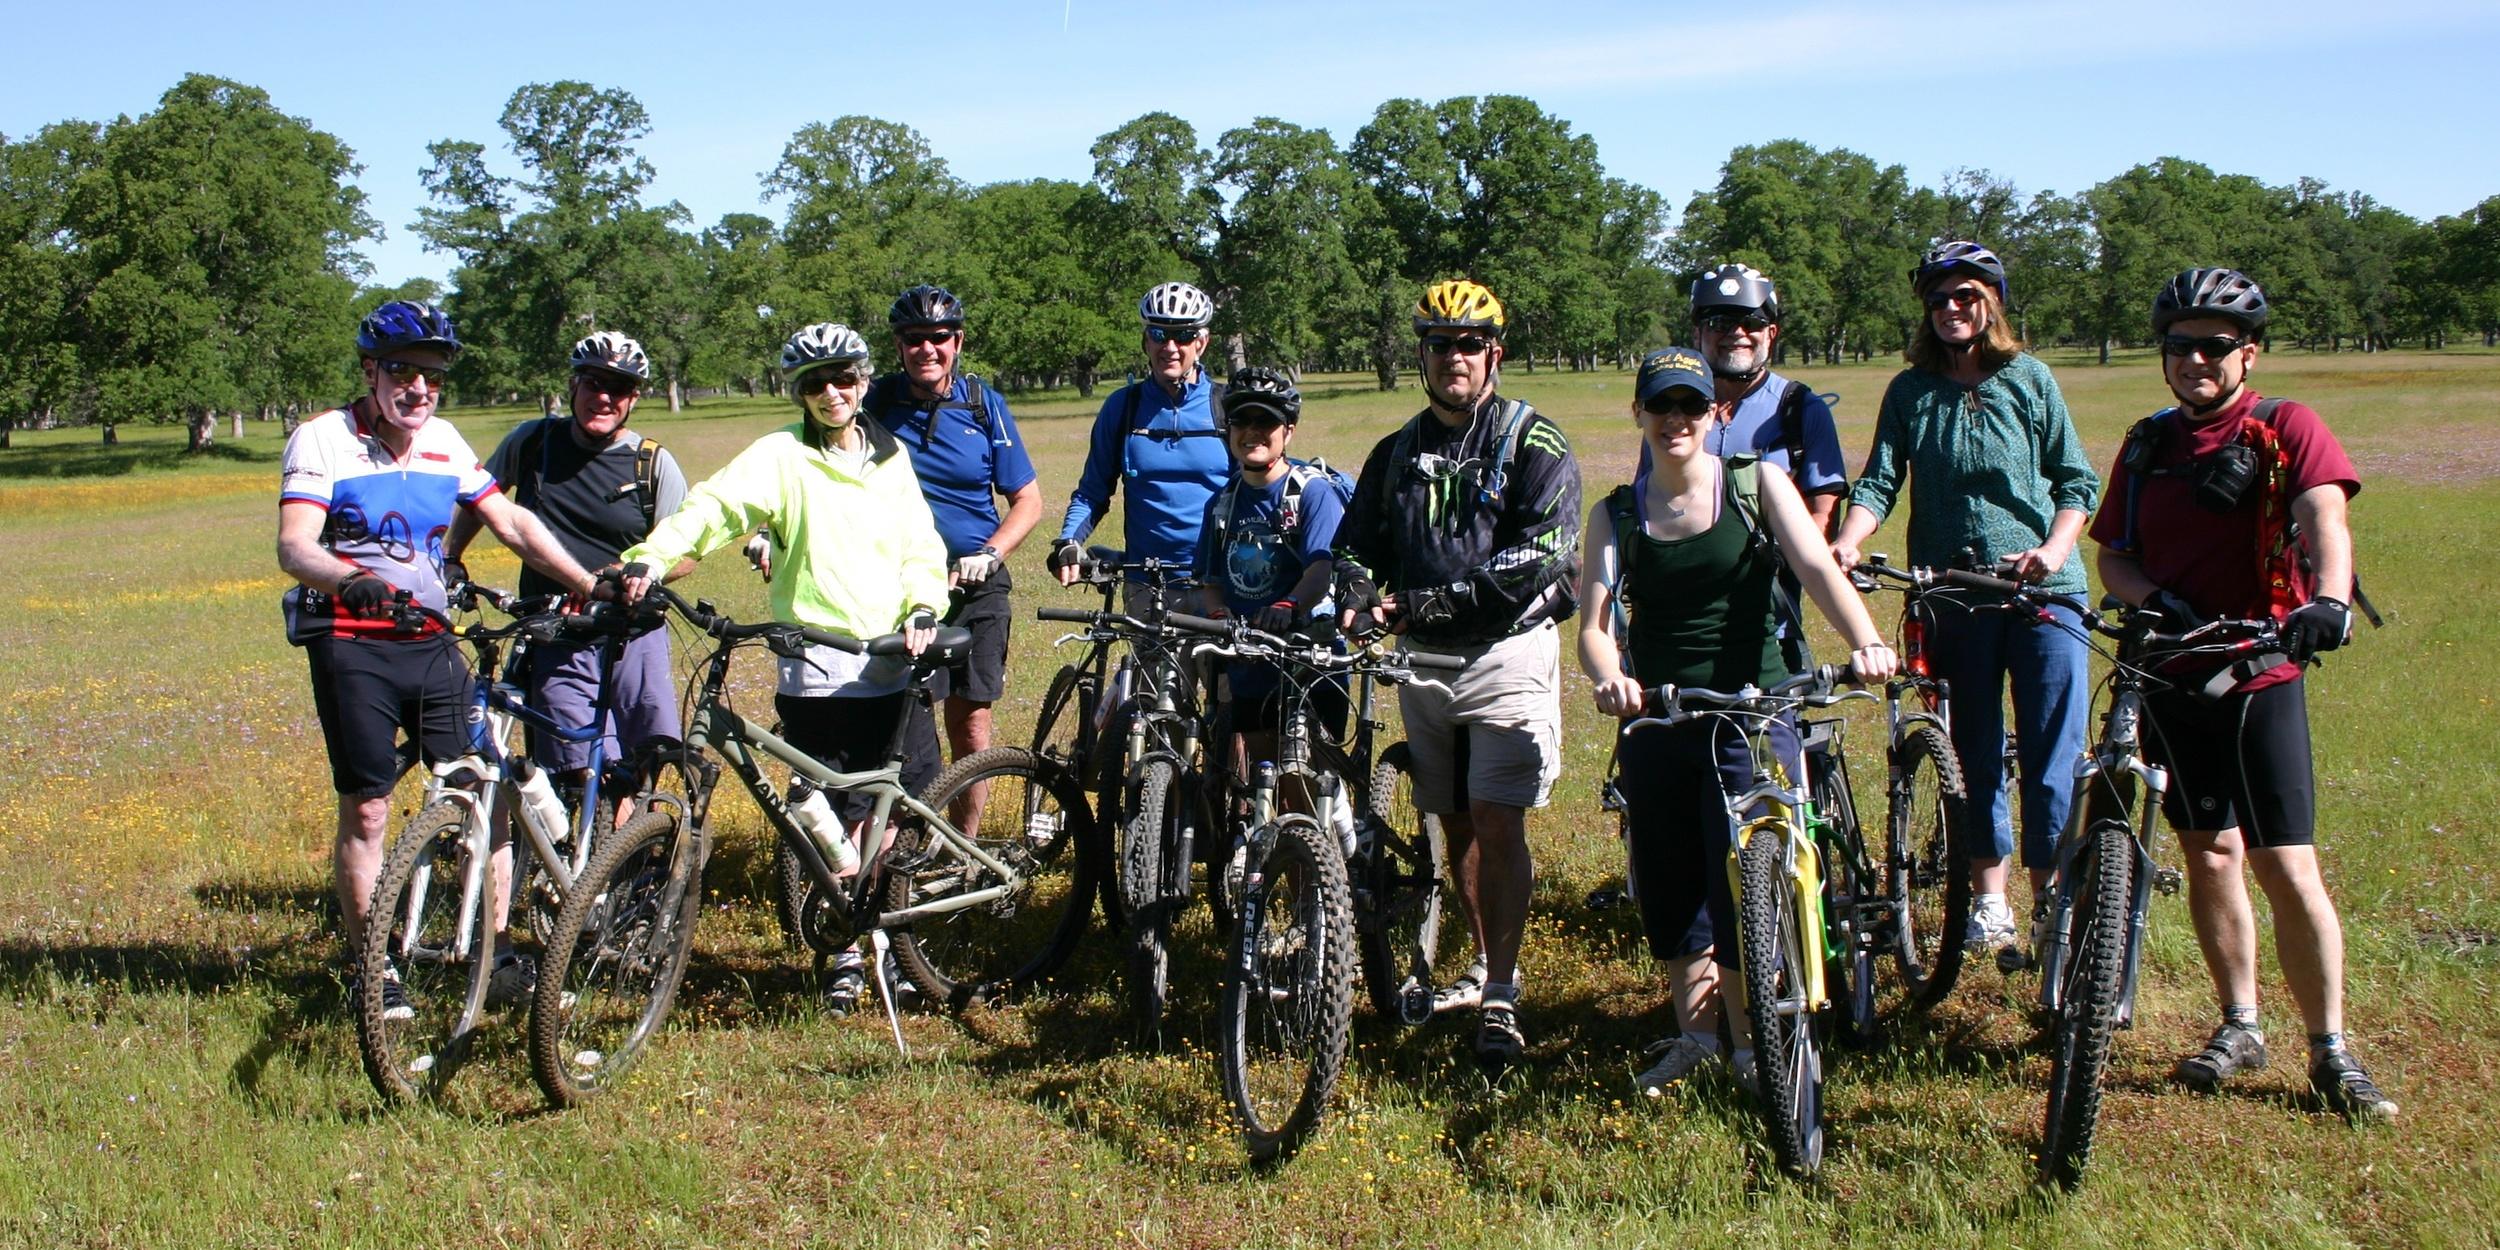 Biking at Fenwood Ranch